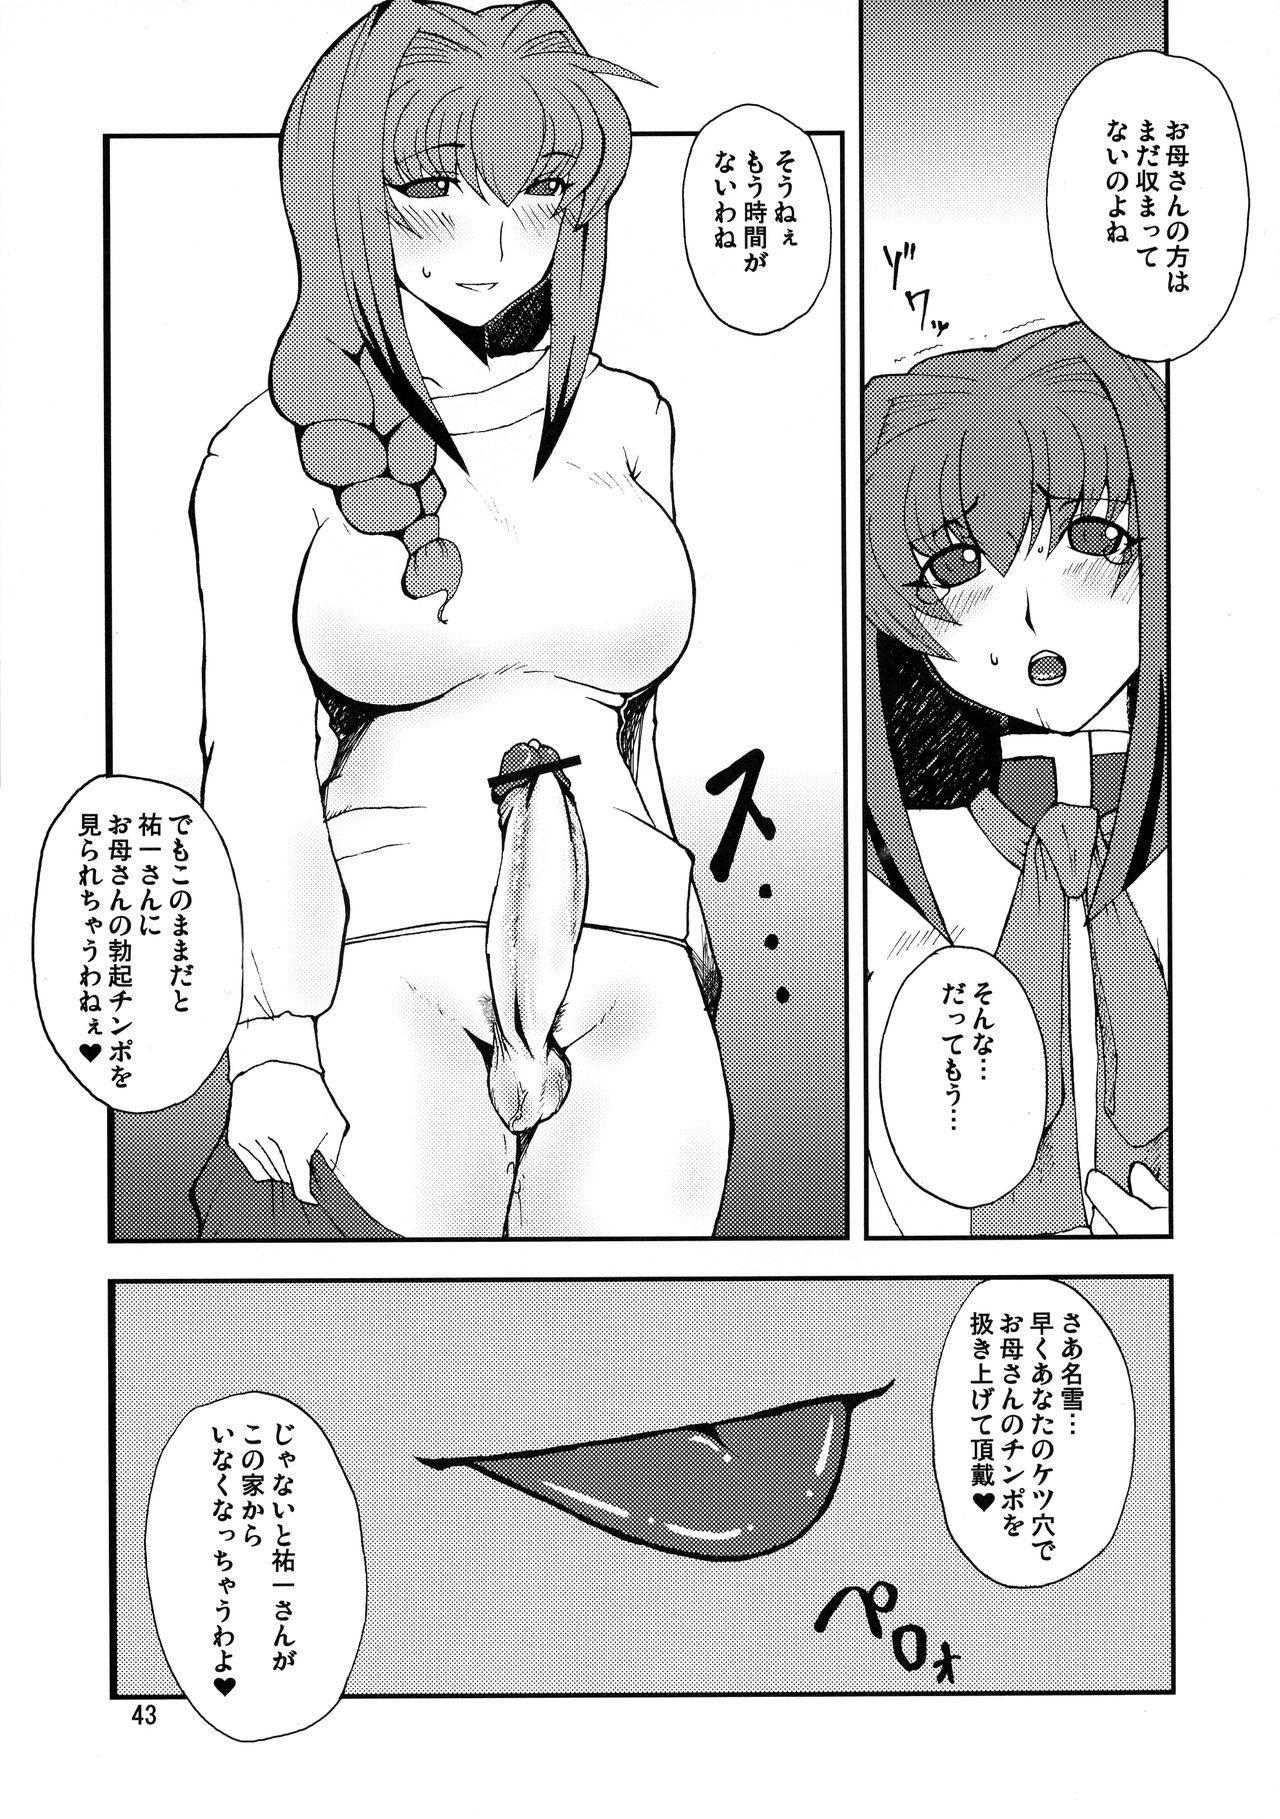 Kyouki Vol. 3~5 Remake Ver. 42